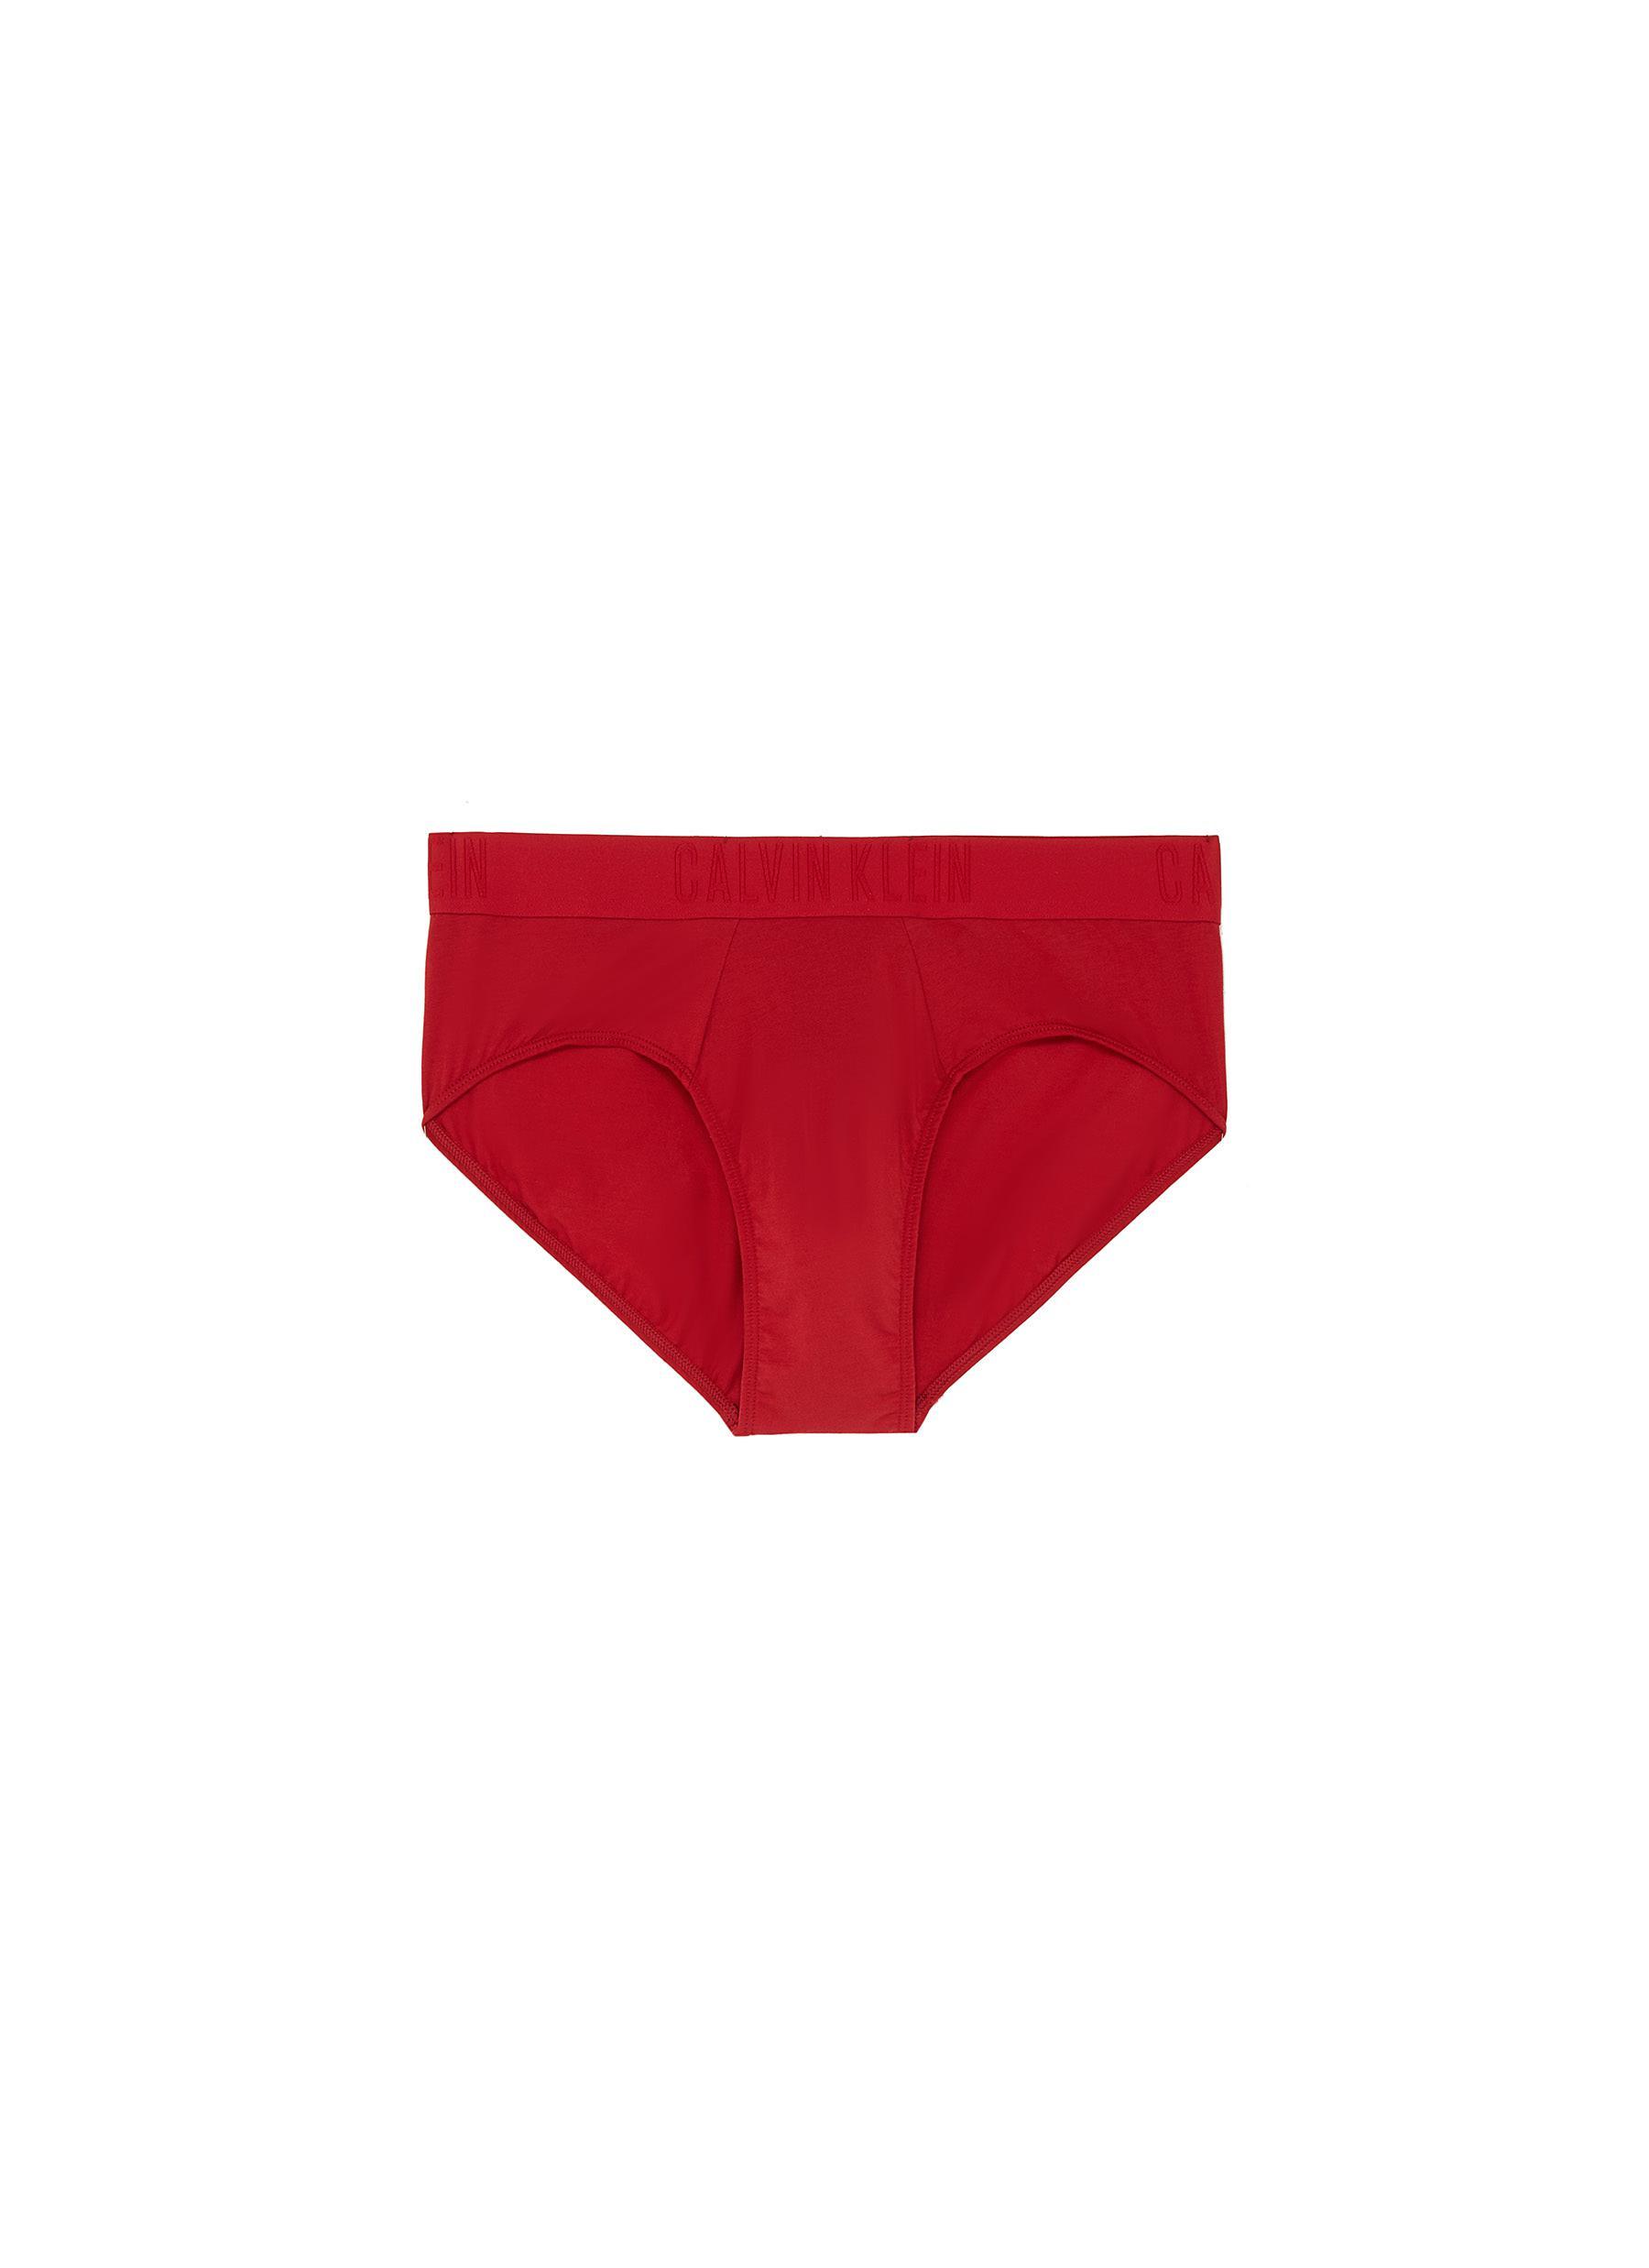 27b1d0a25377 CALVIN KLEIN UNDERWEAR | 'CK Black' logo waistband briefs | Men ...